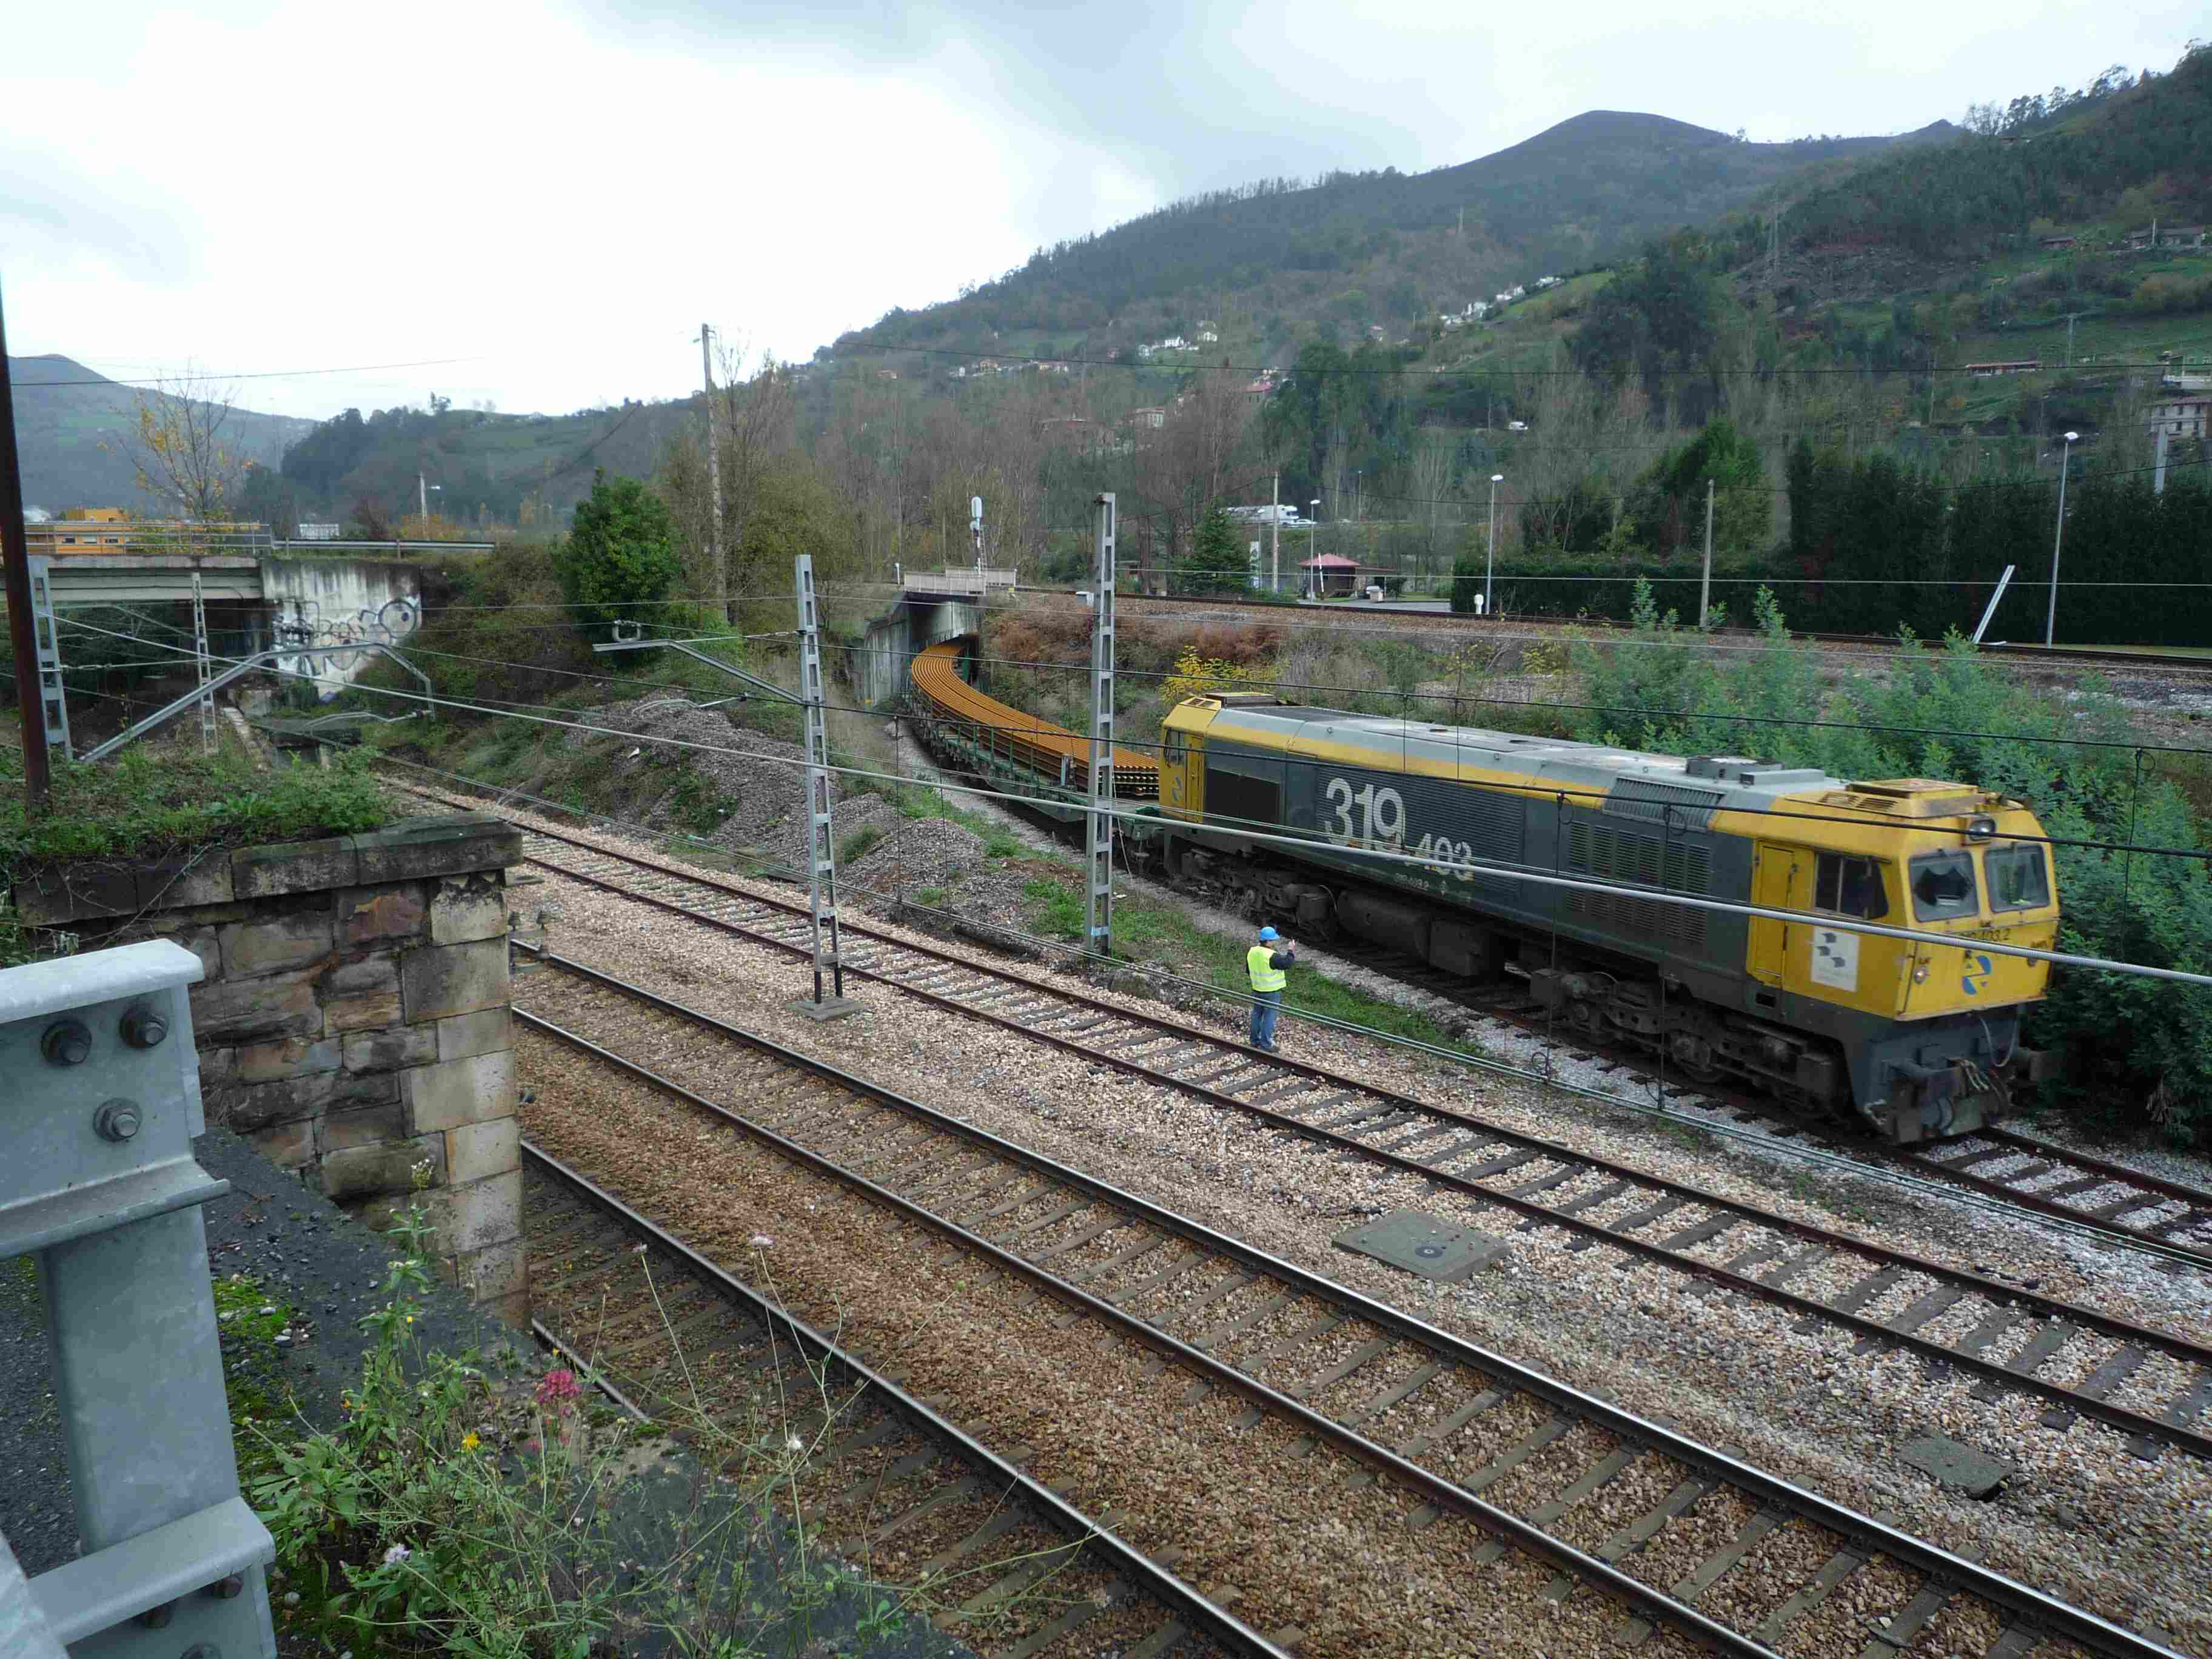 2014-12-01-Mieres-Primer-tren-DF-Rail_02.jpg